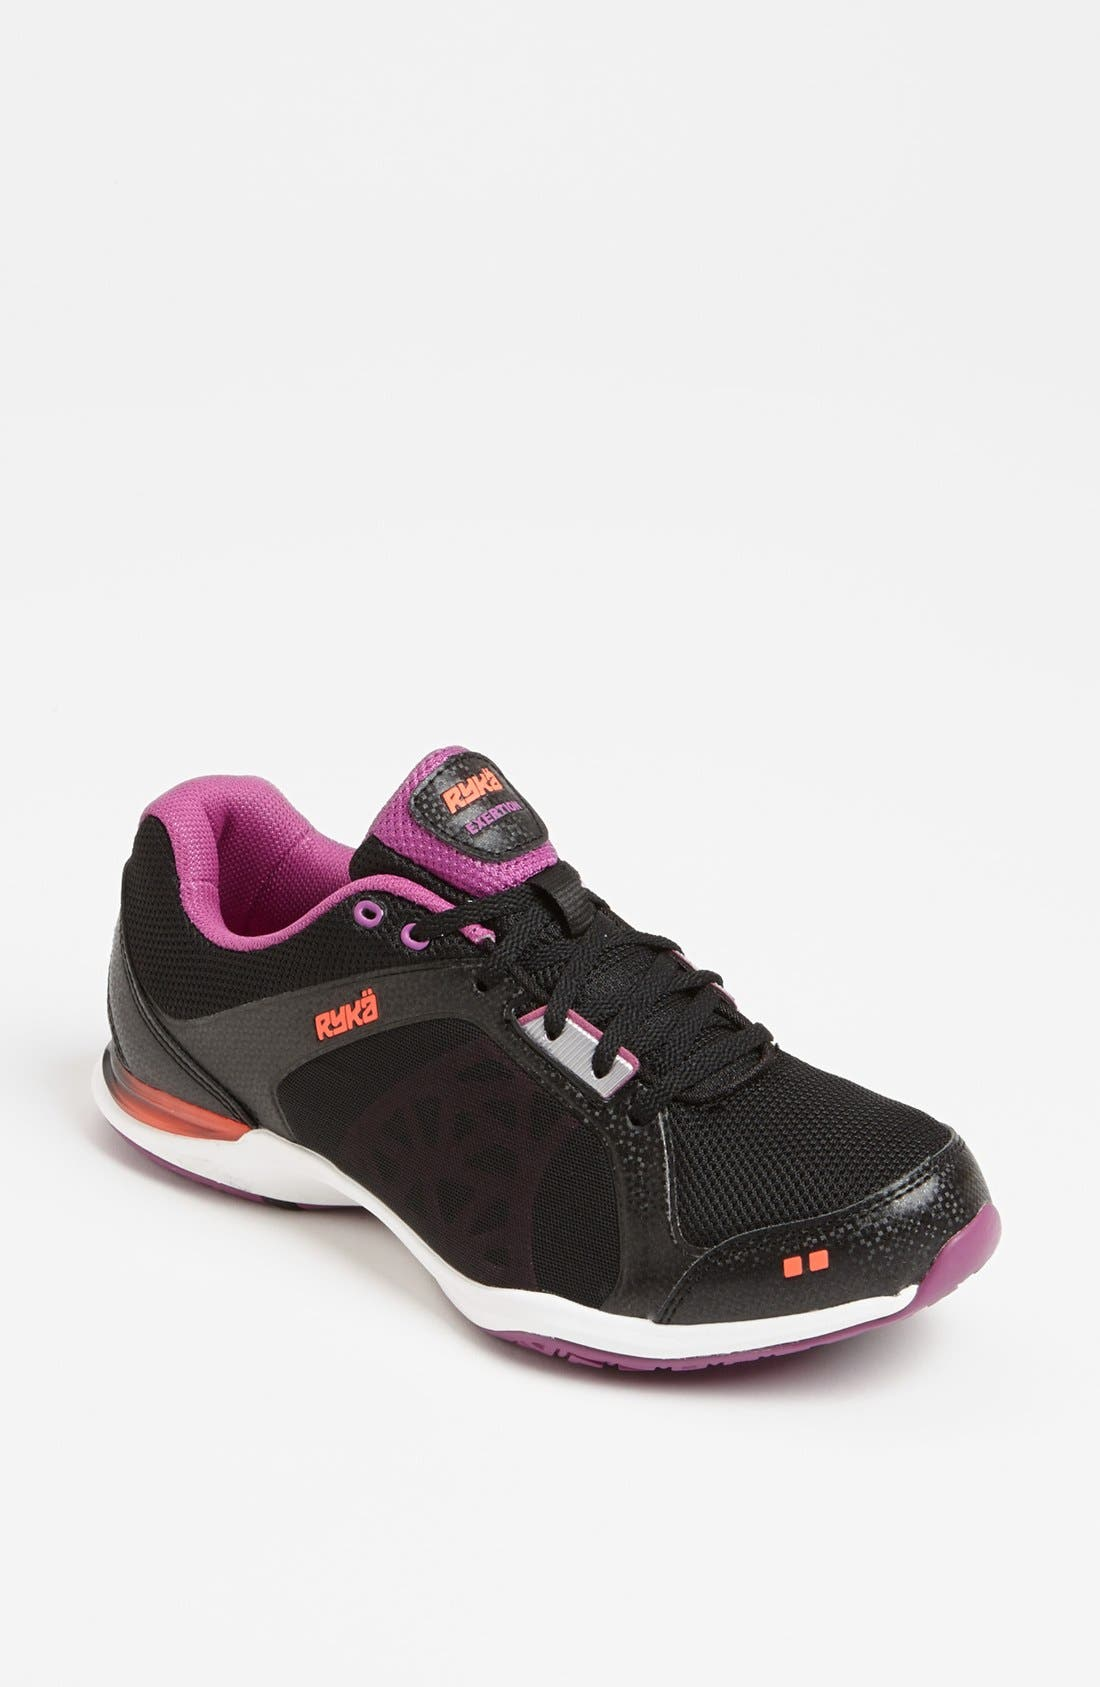 Main Image - rykä 'Exertion' Training Shoe (Women)